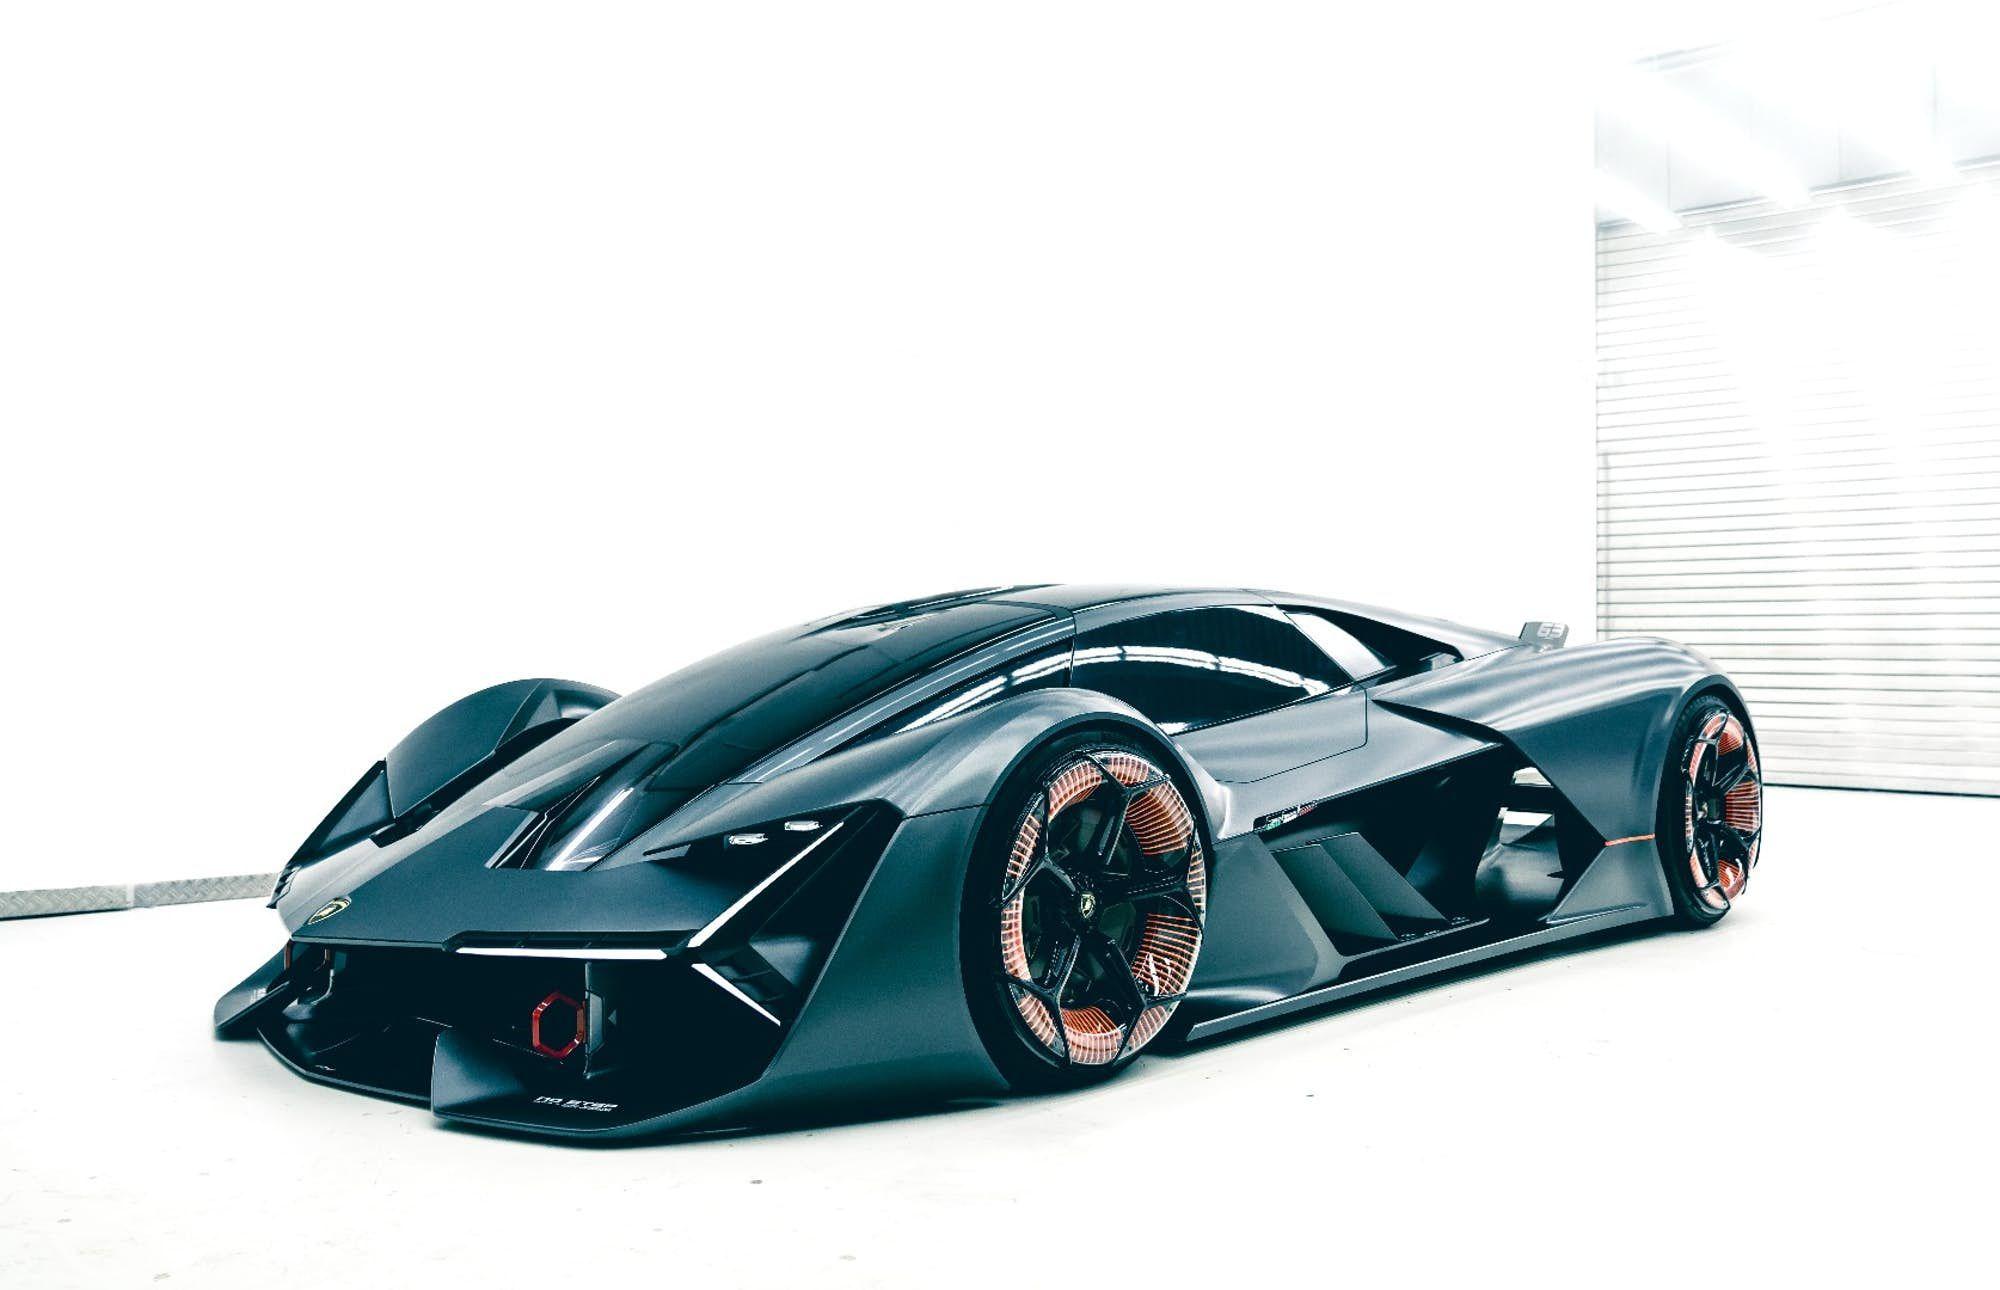 Lamborghini Sets Sights On Electrified Future With Terzo Millennio